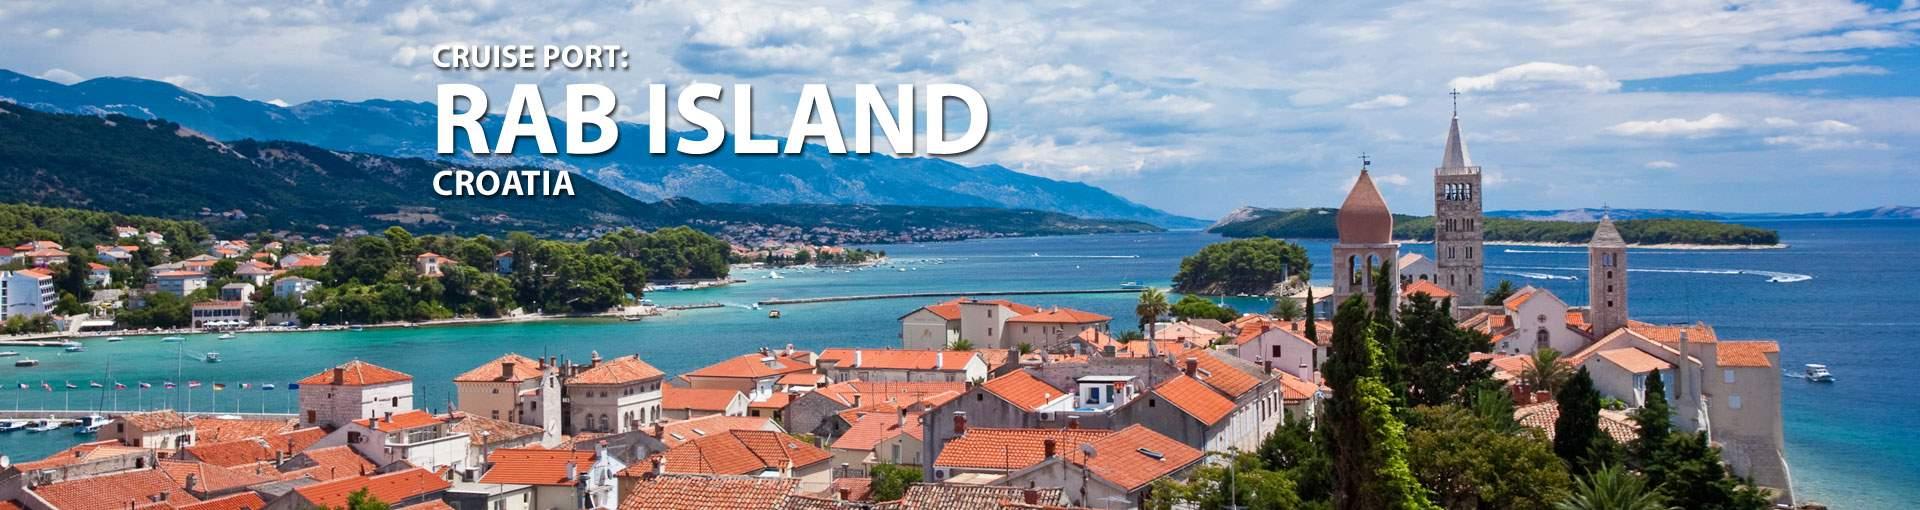 Cruises to Rab Island, Croatia